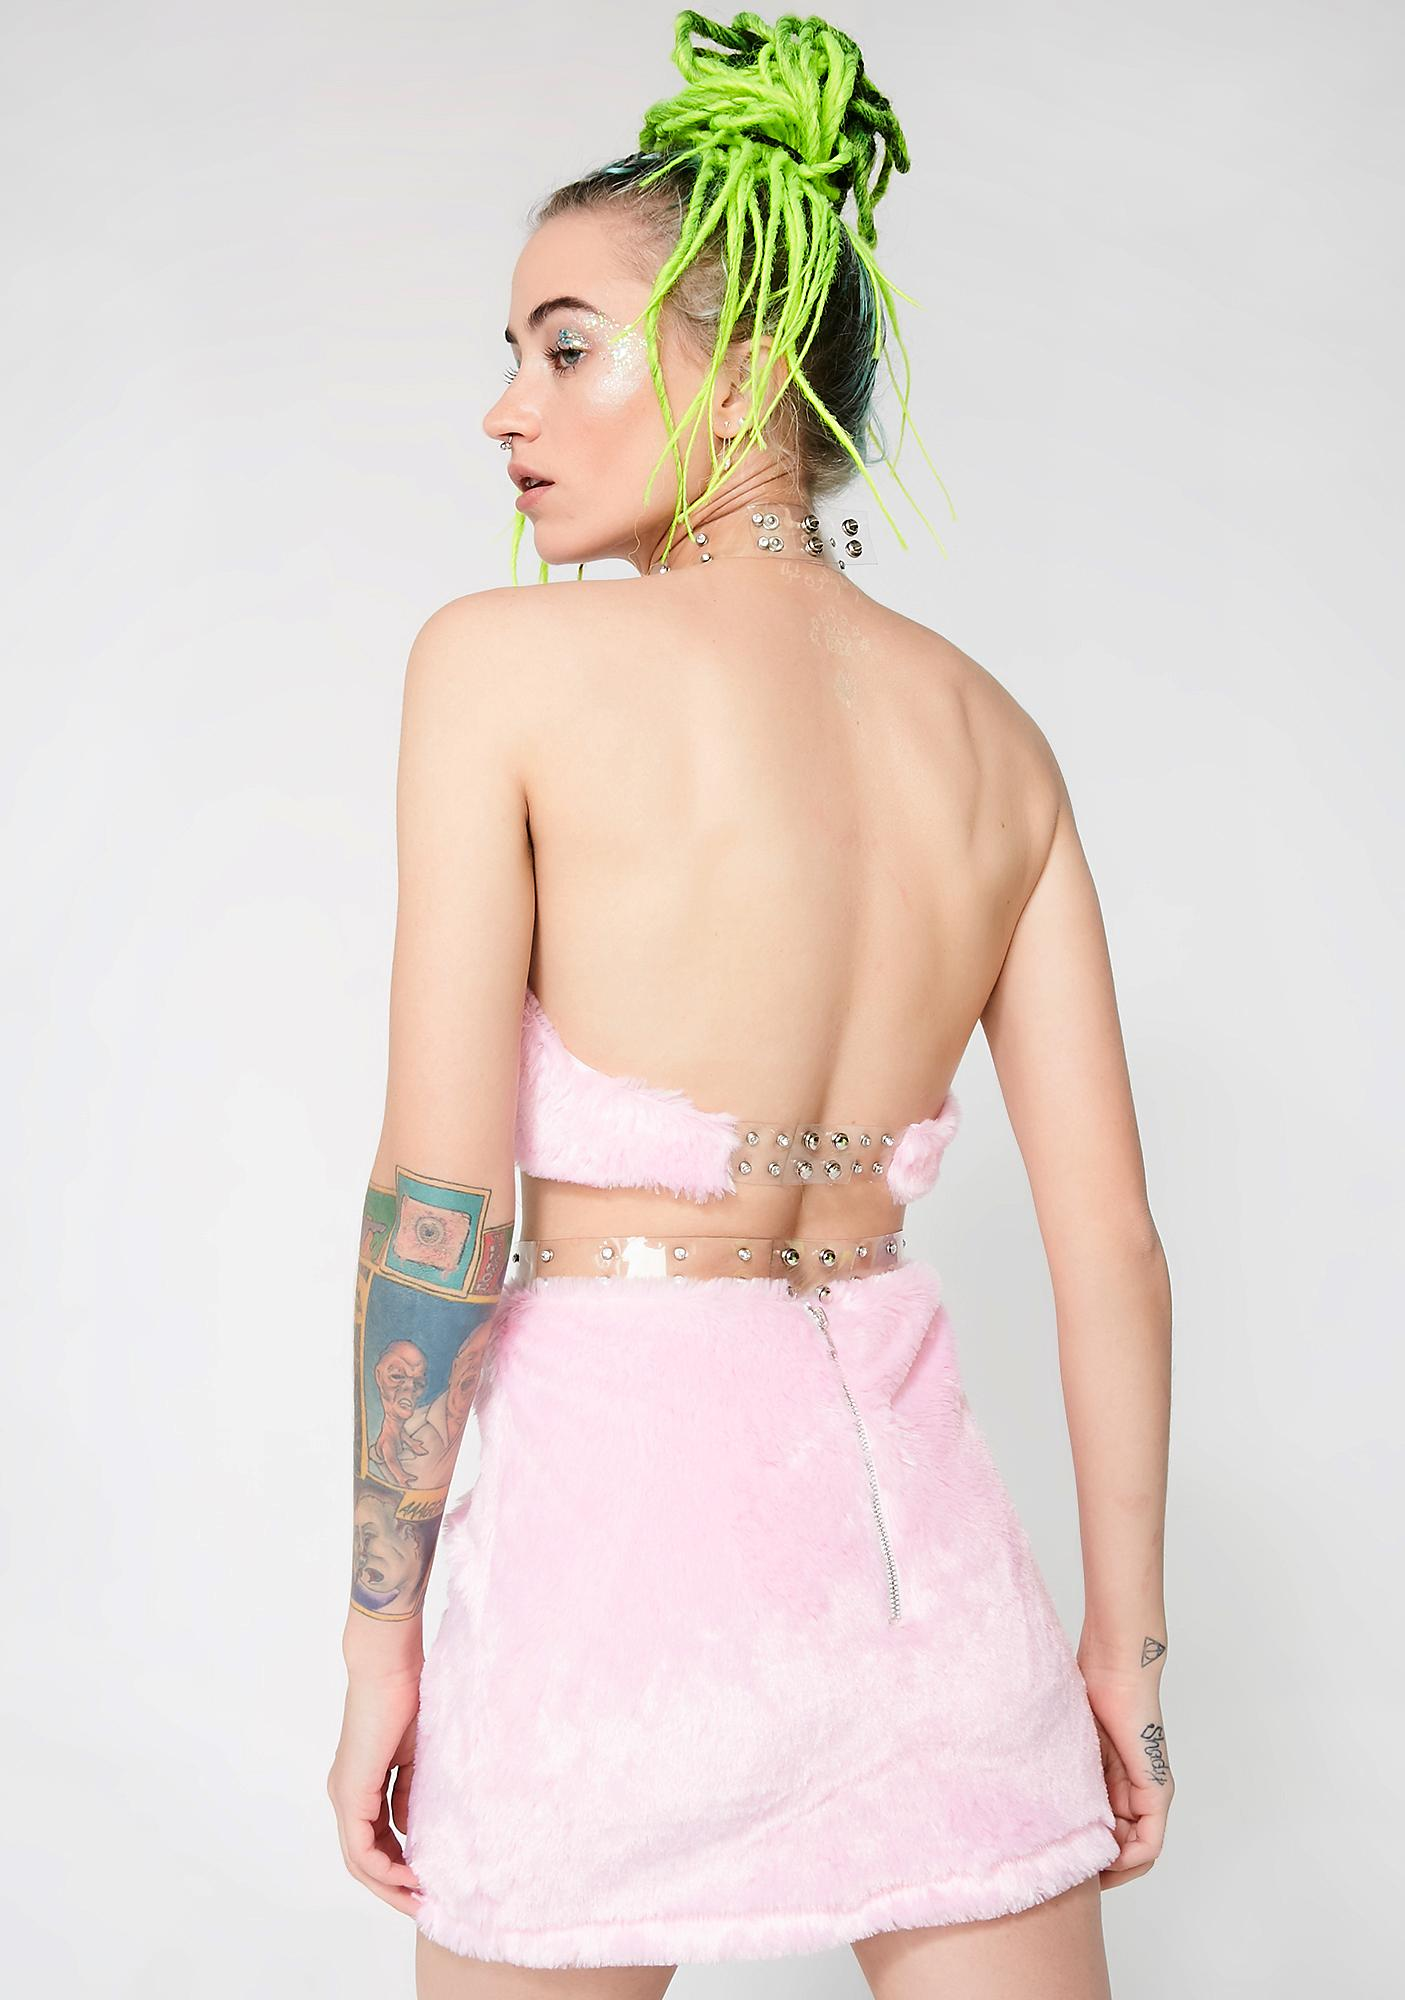 ebbe34354cc13 Club Exx Fuzzy Crop Top Skirt Pink Set